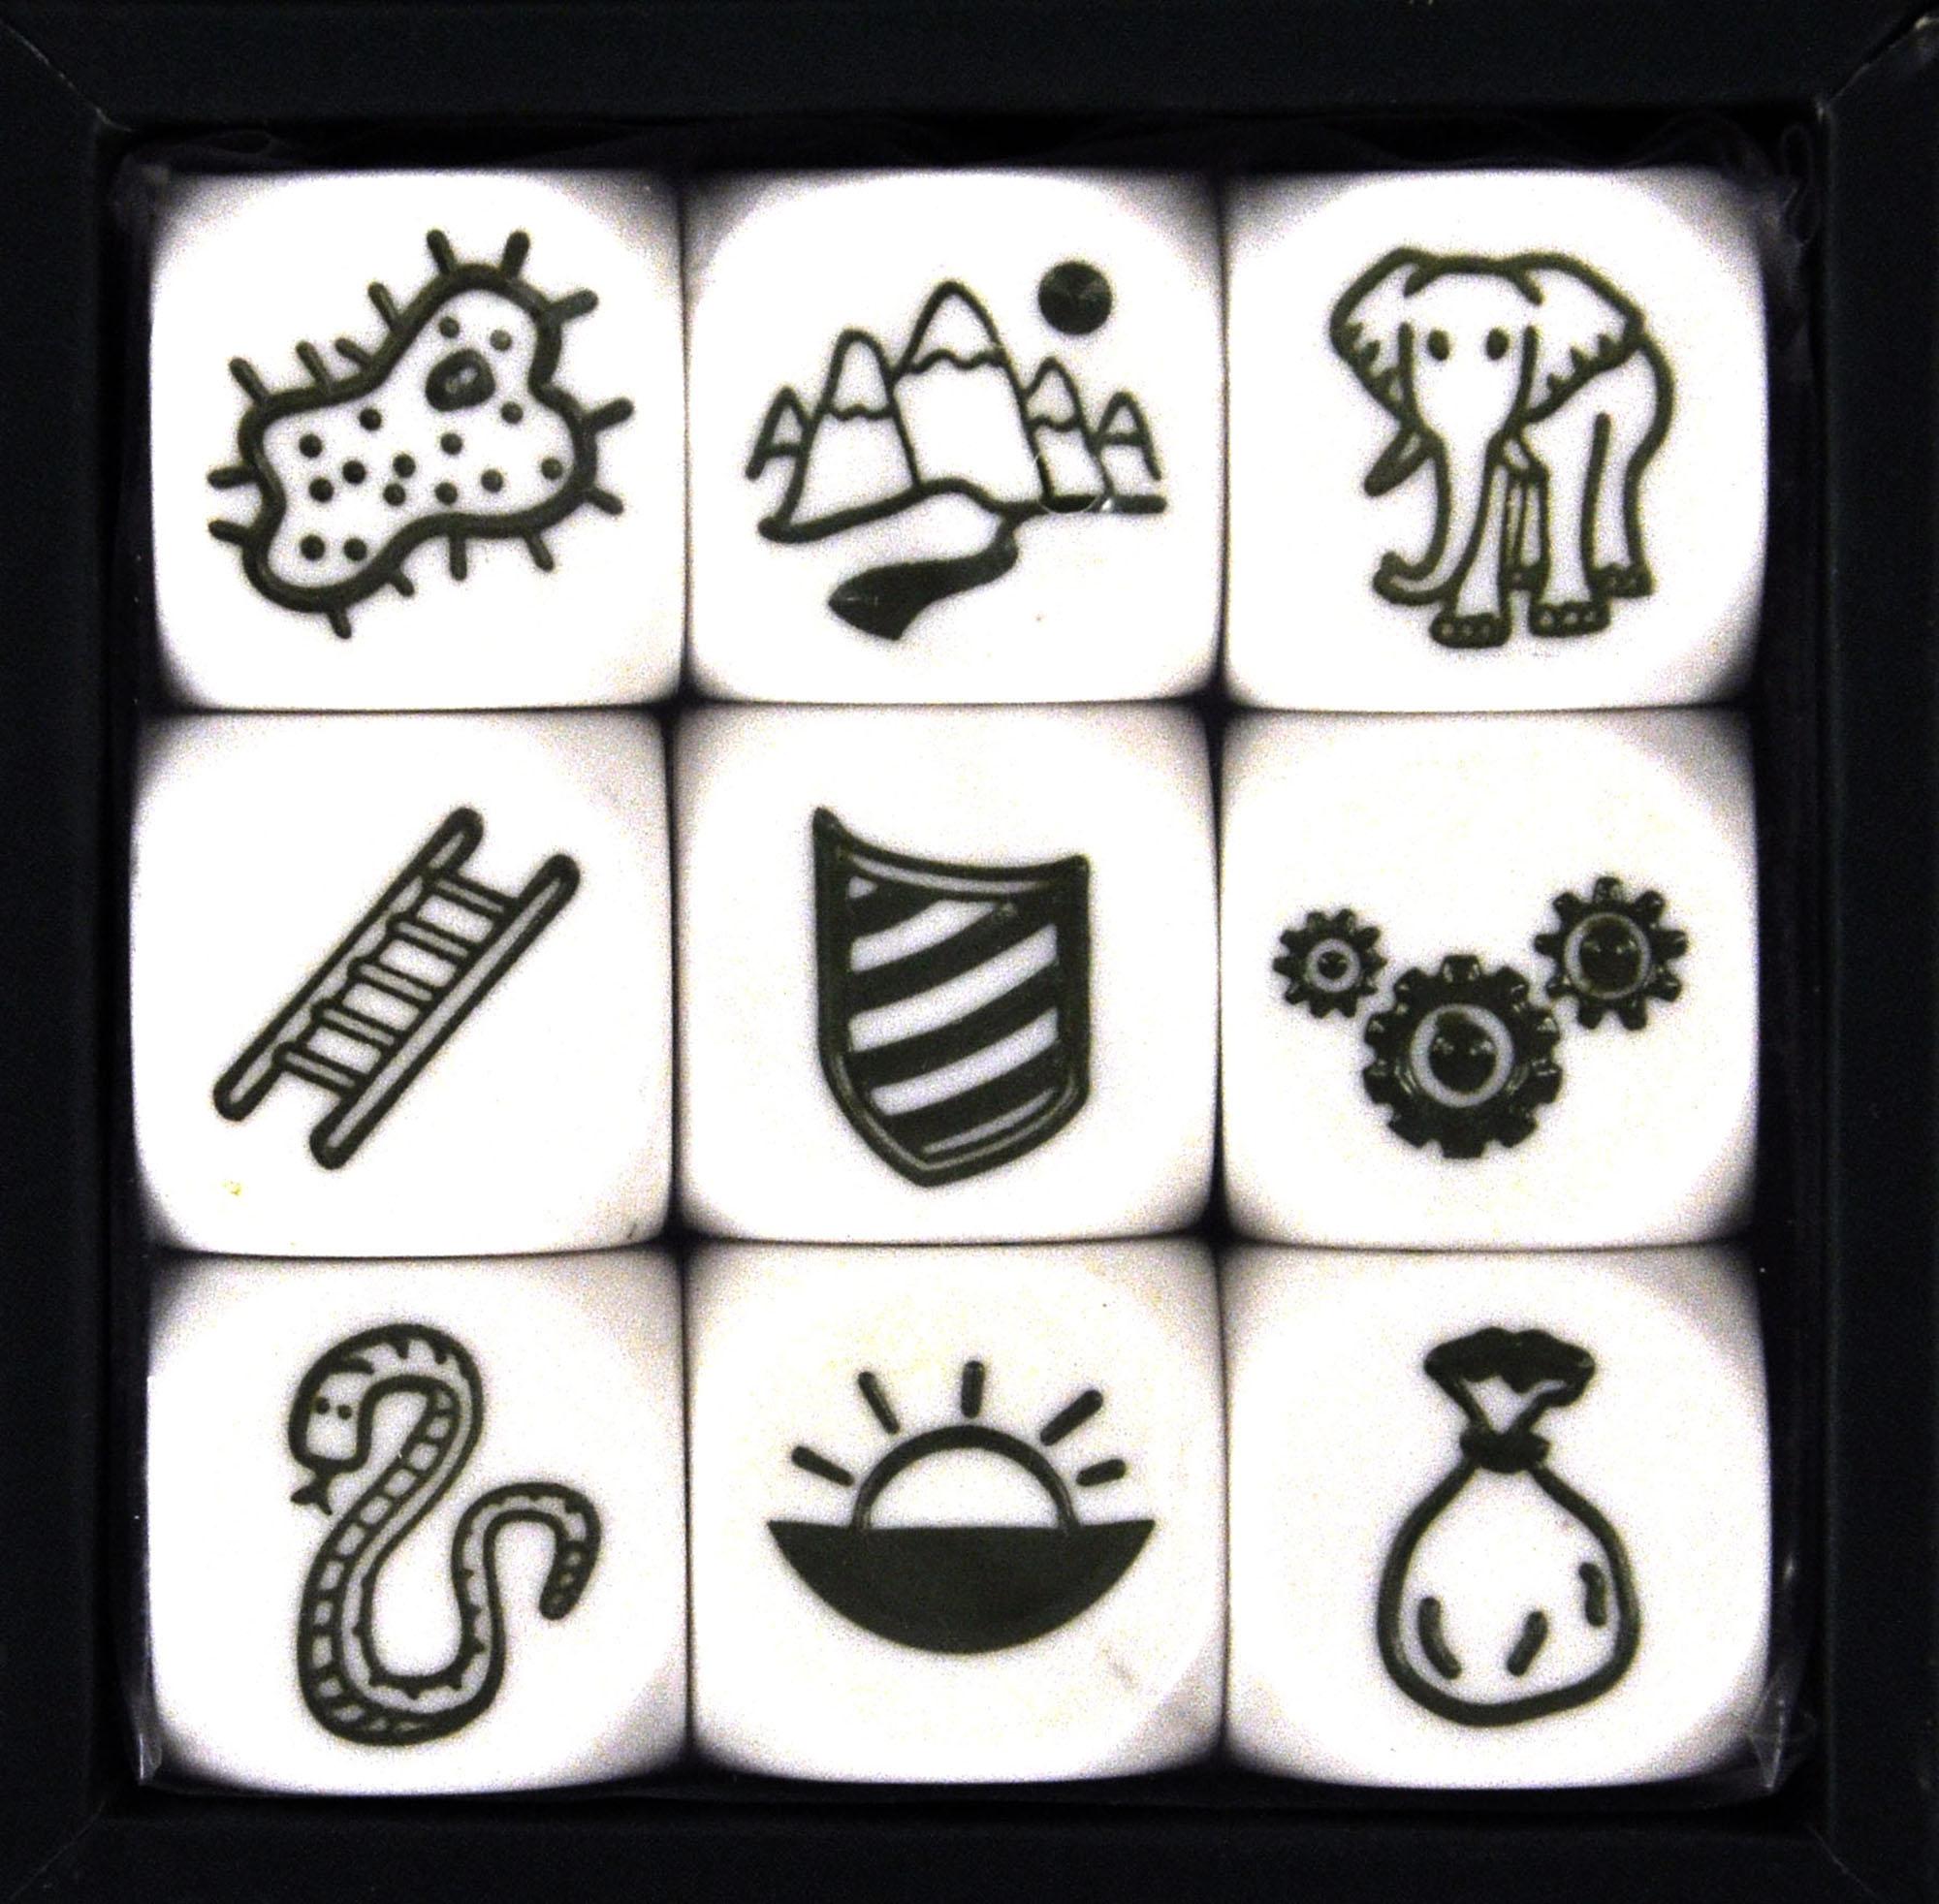 Story Cubes Symbole Bedeutung